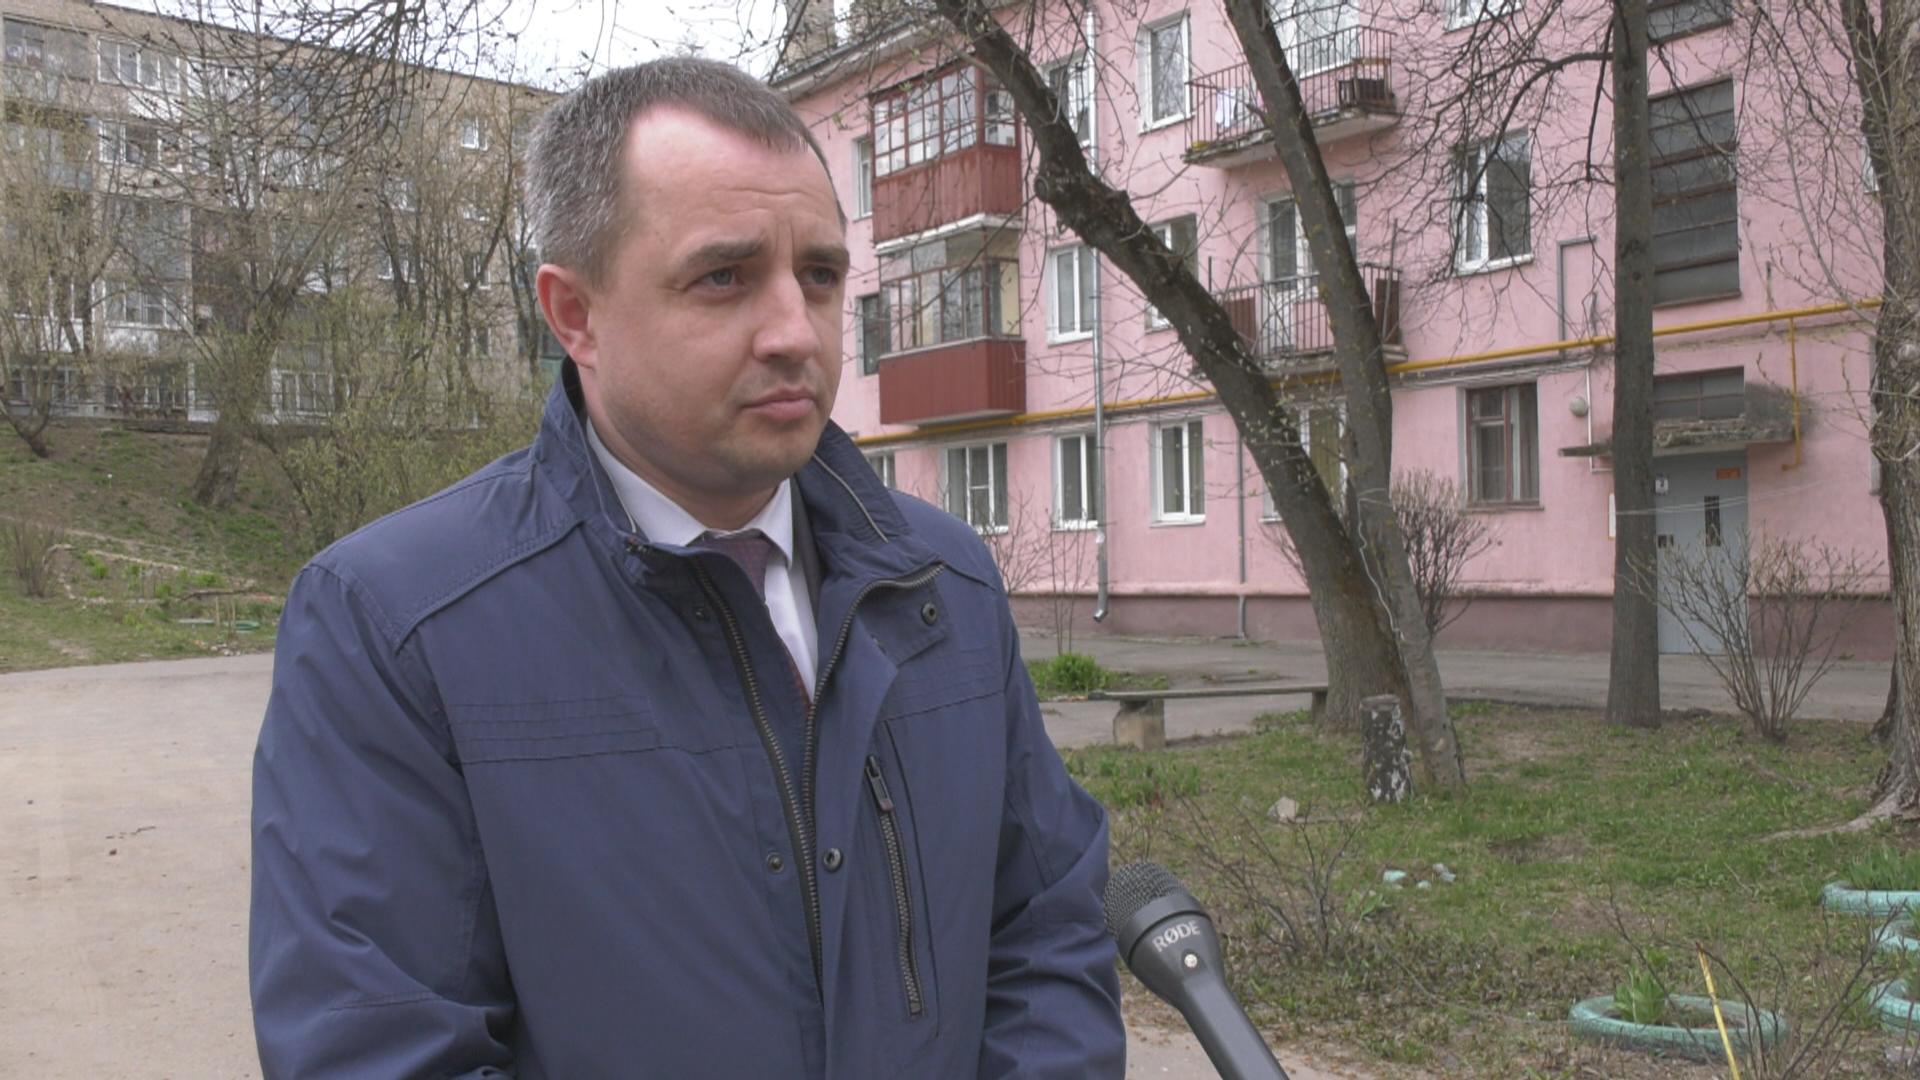 proverka gaza - Проверка газового оборудования в Витебске (видео)